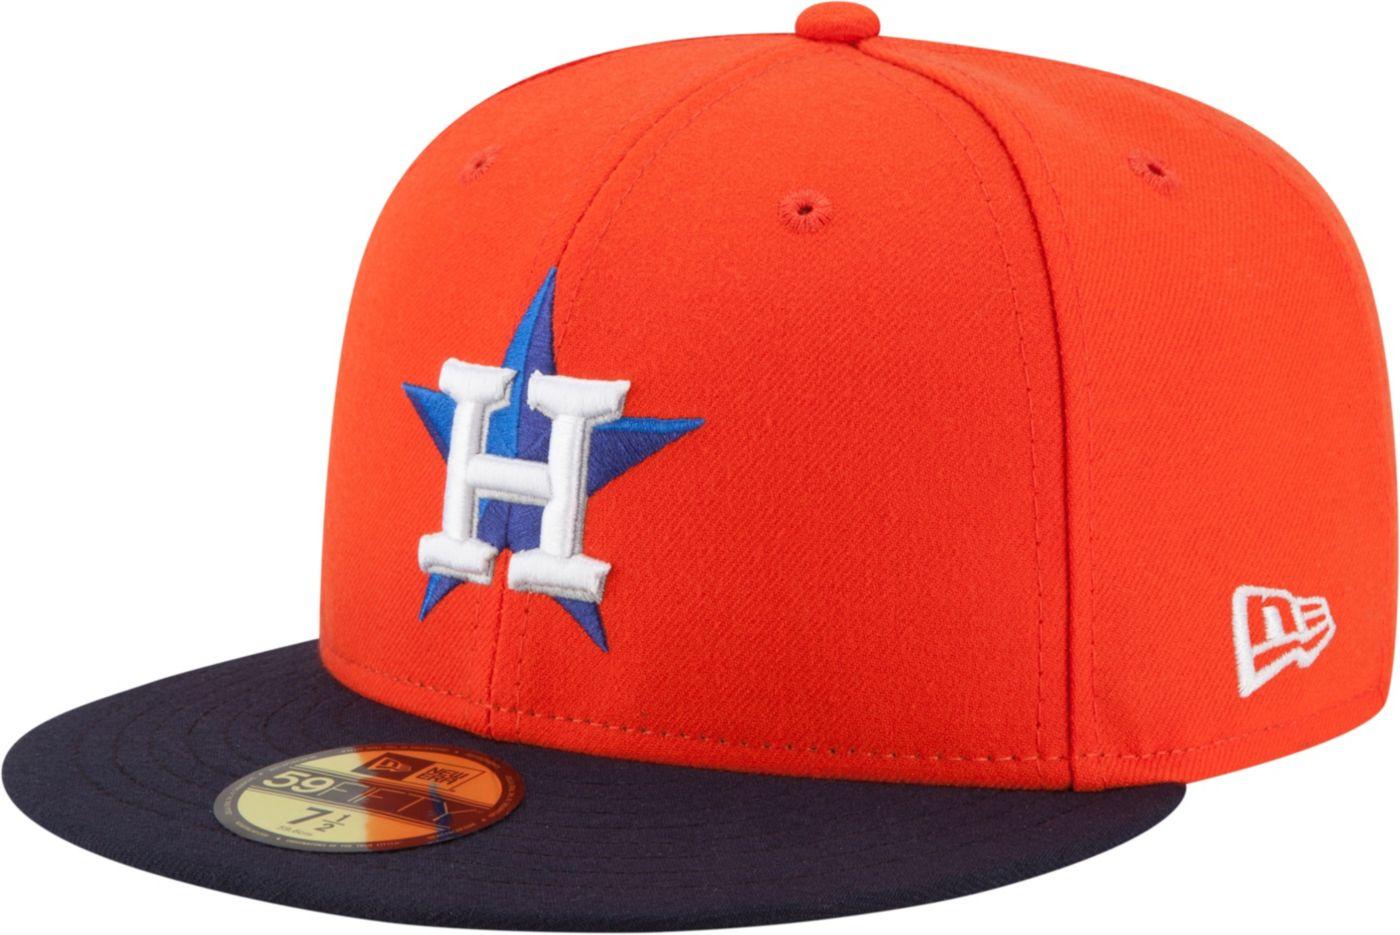 New Era Men's Houston Astros 59Fifty Alternate Orange Authentic Hat